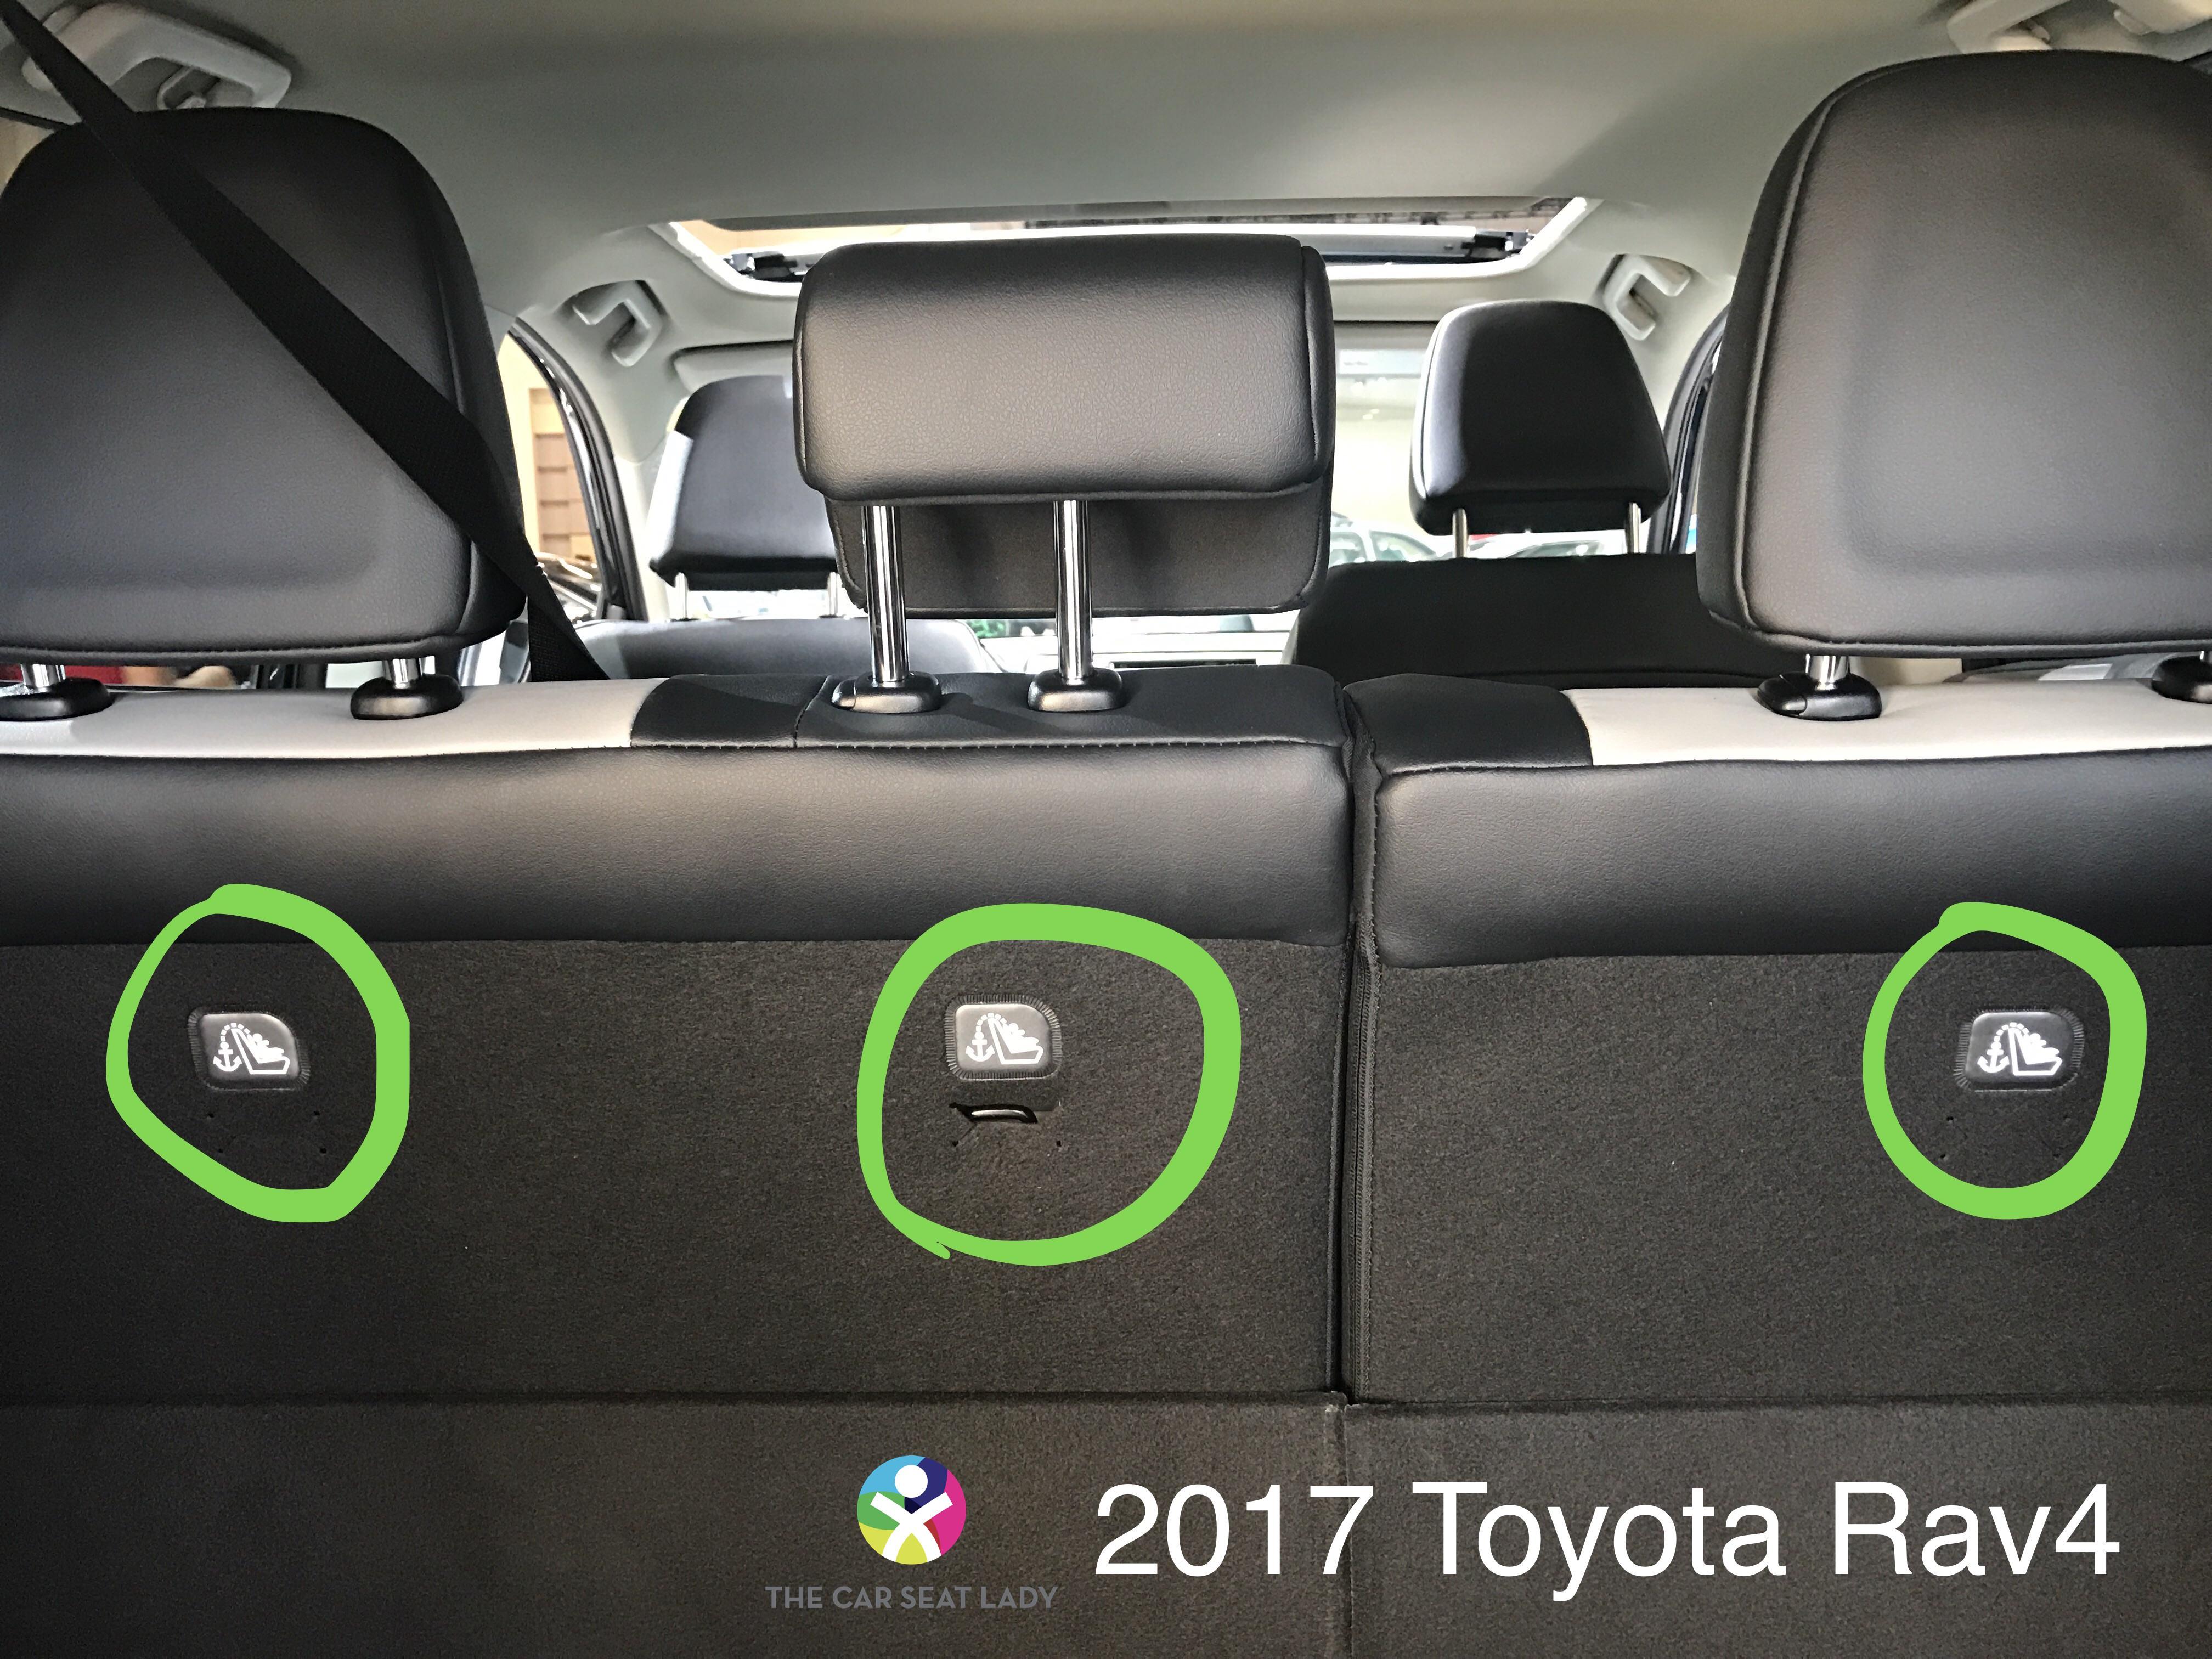 The Car Seat Lady Toyota Rav4